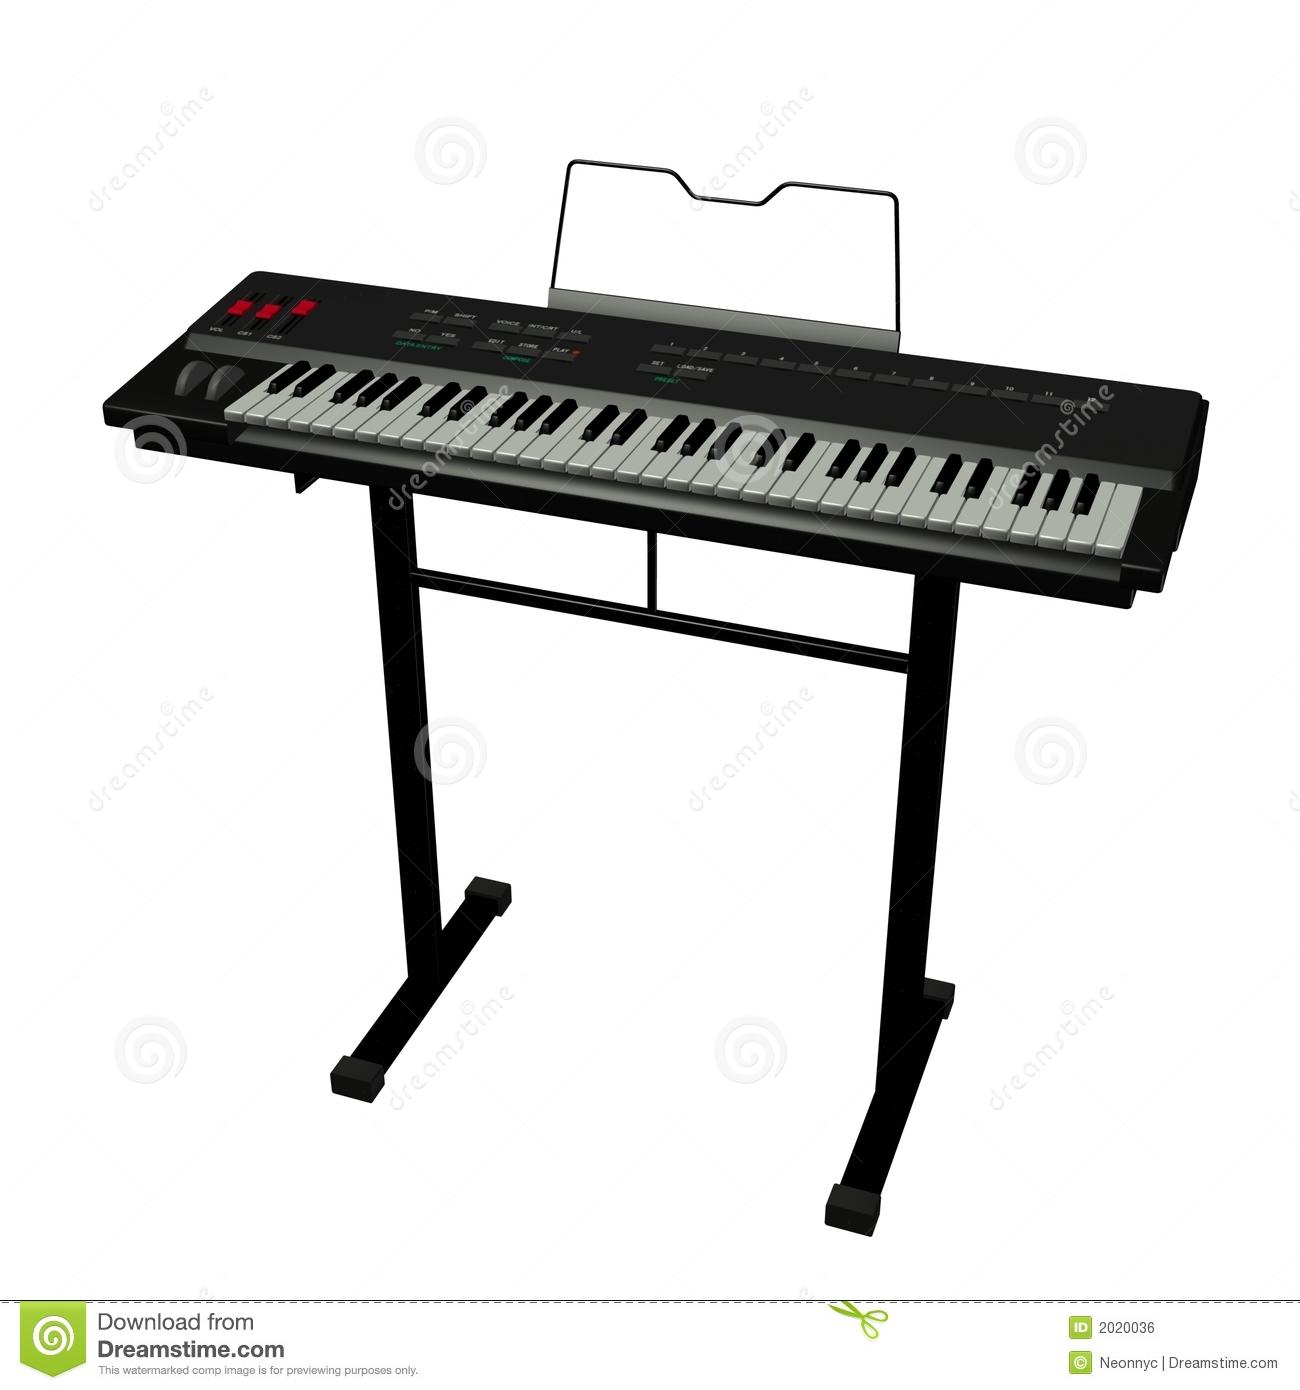 Keyboard Clipart Electronic Keyboard Keyboard Electronic